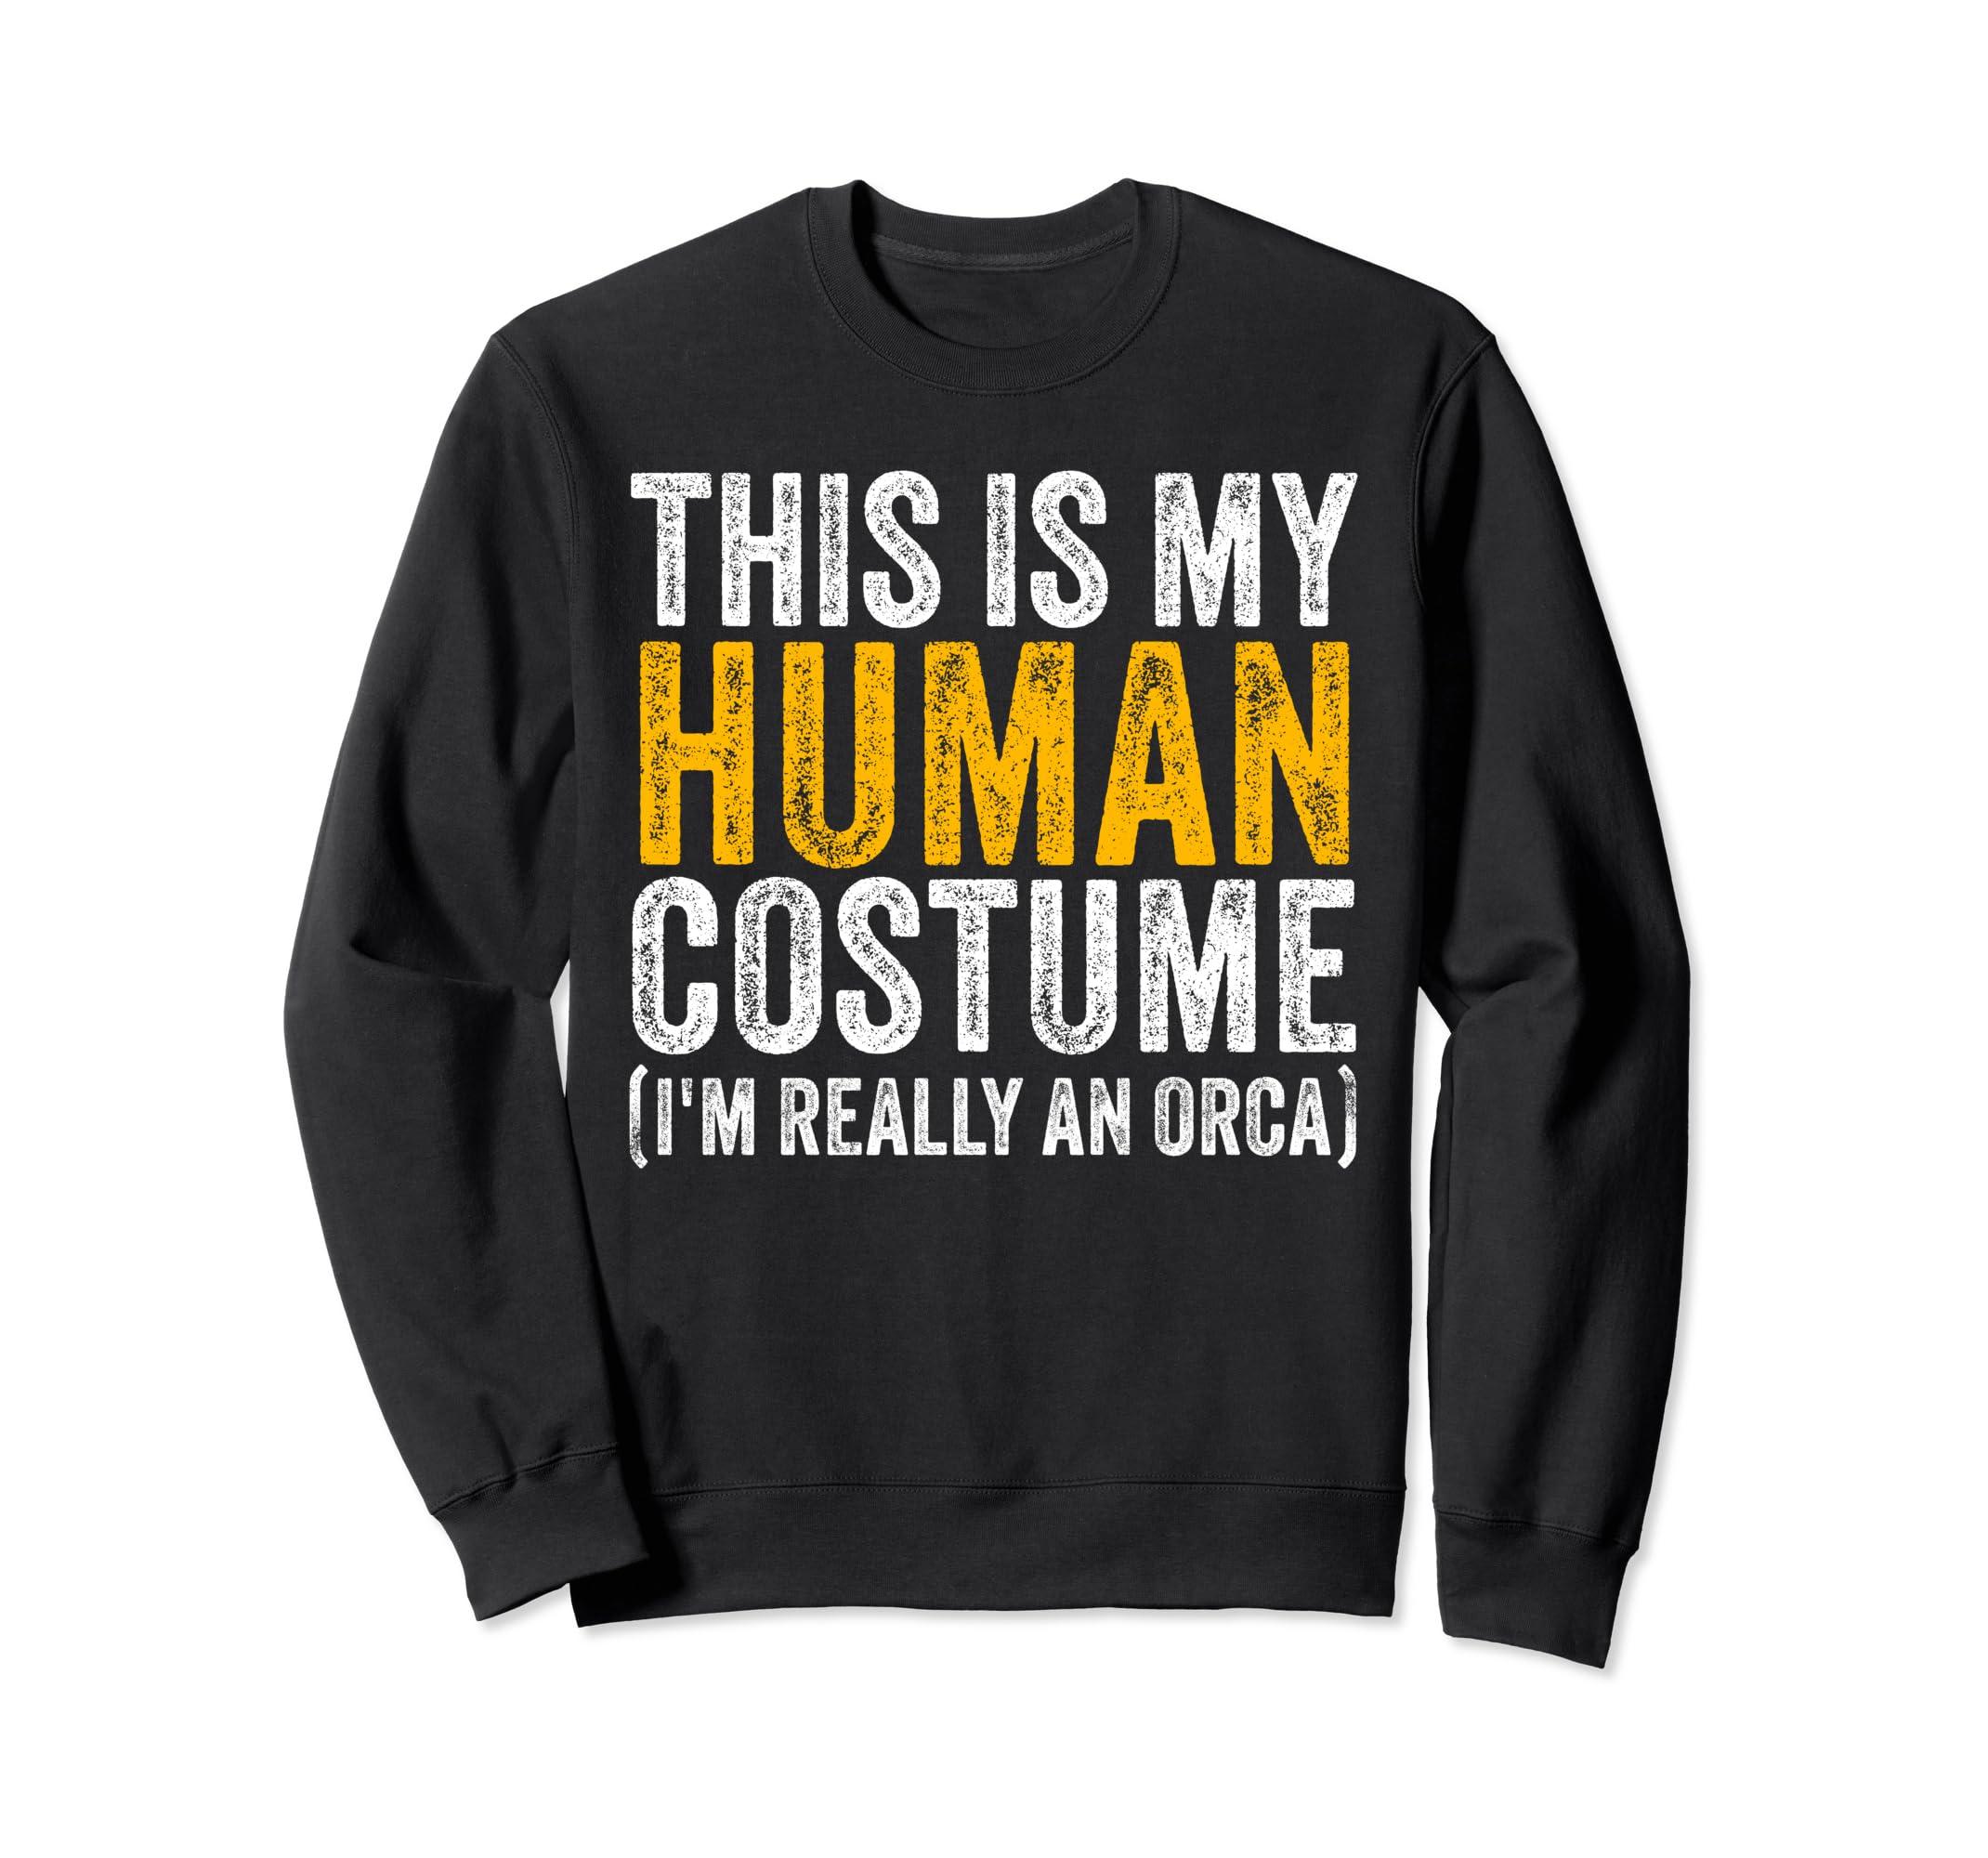 This Is My Human Costume I'm Really An Orca Halloween Whale Sweatshirt-Sweatshirt-Black